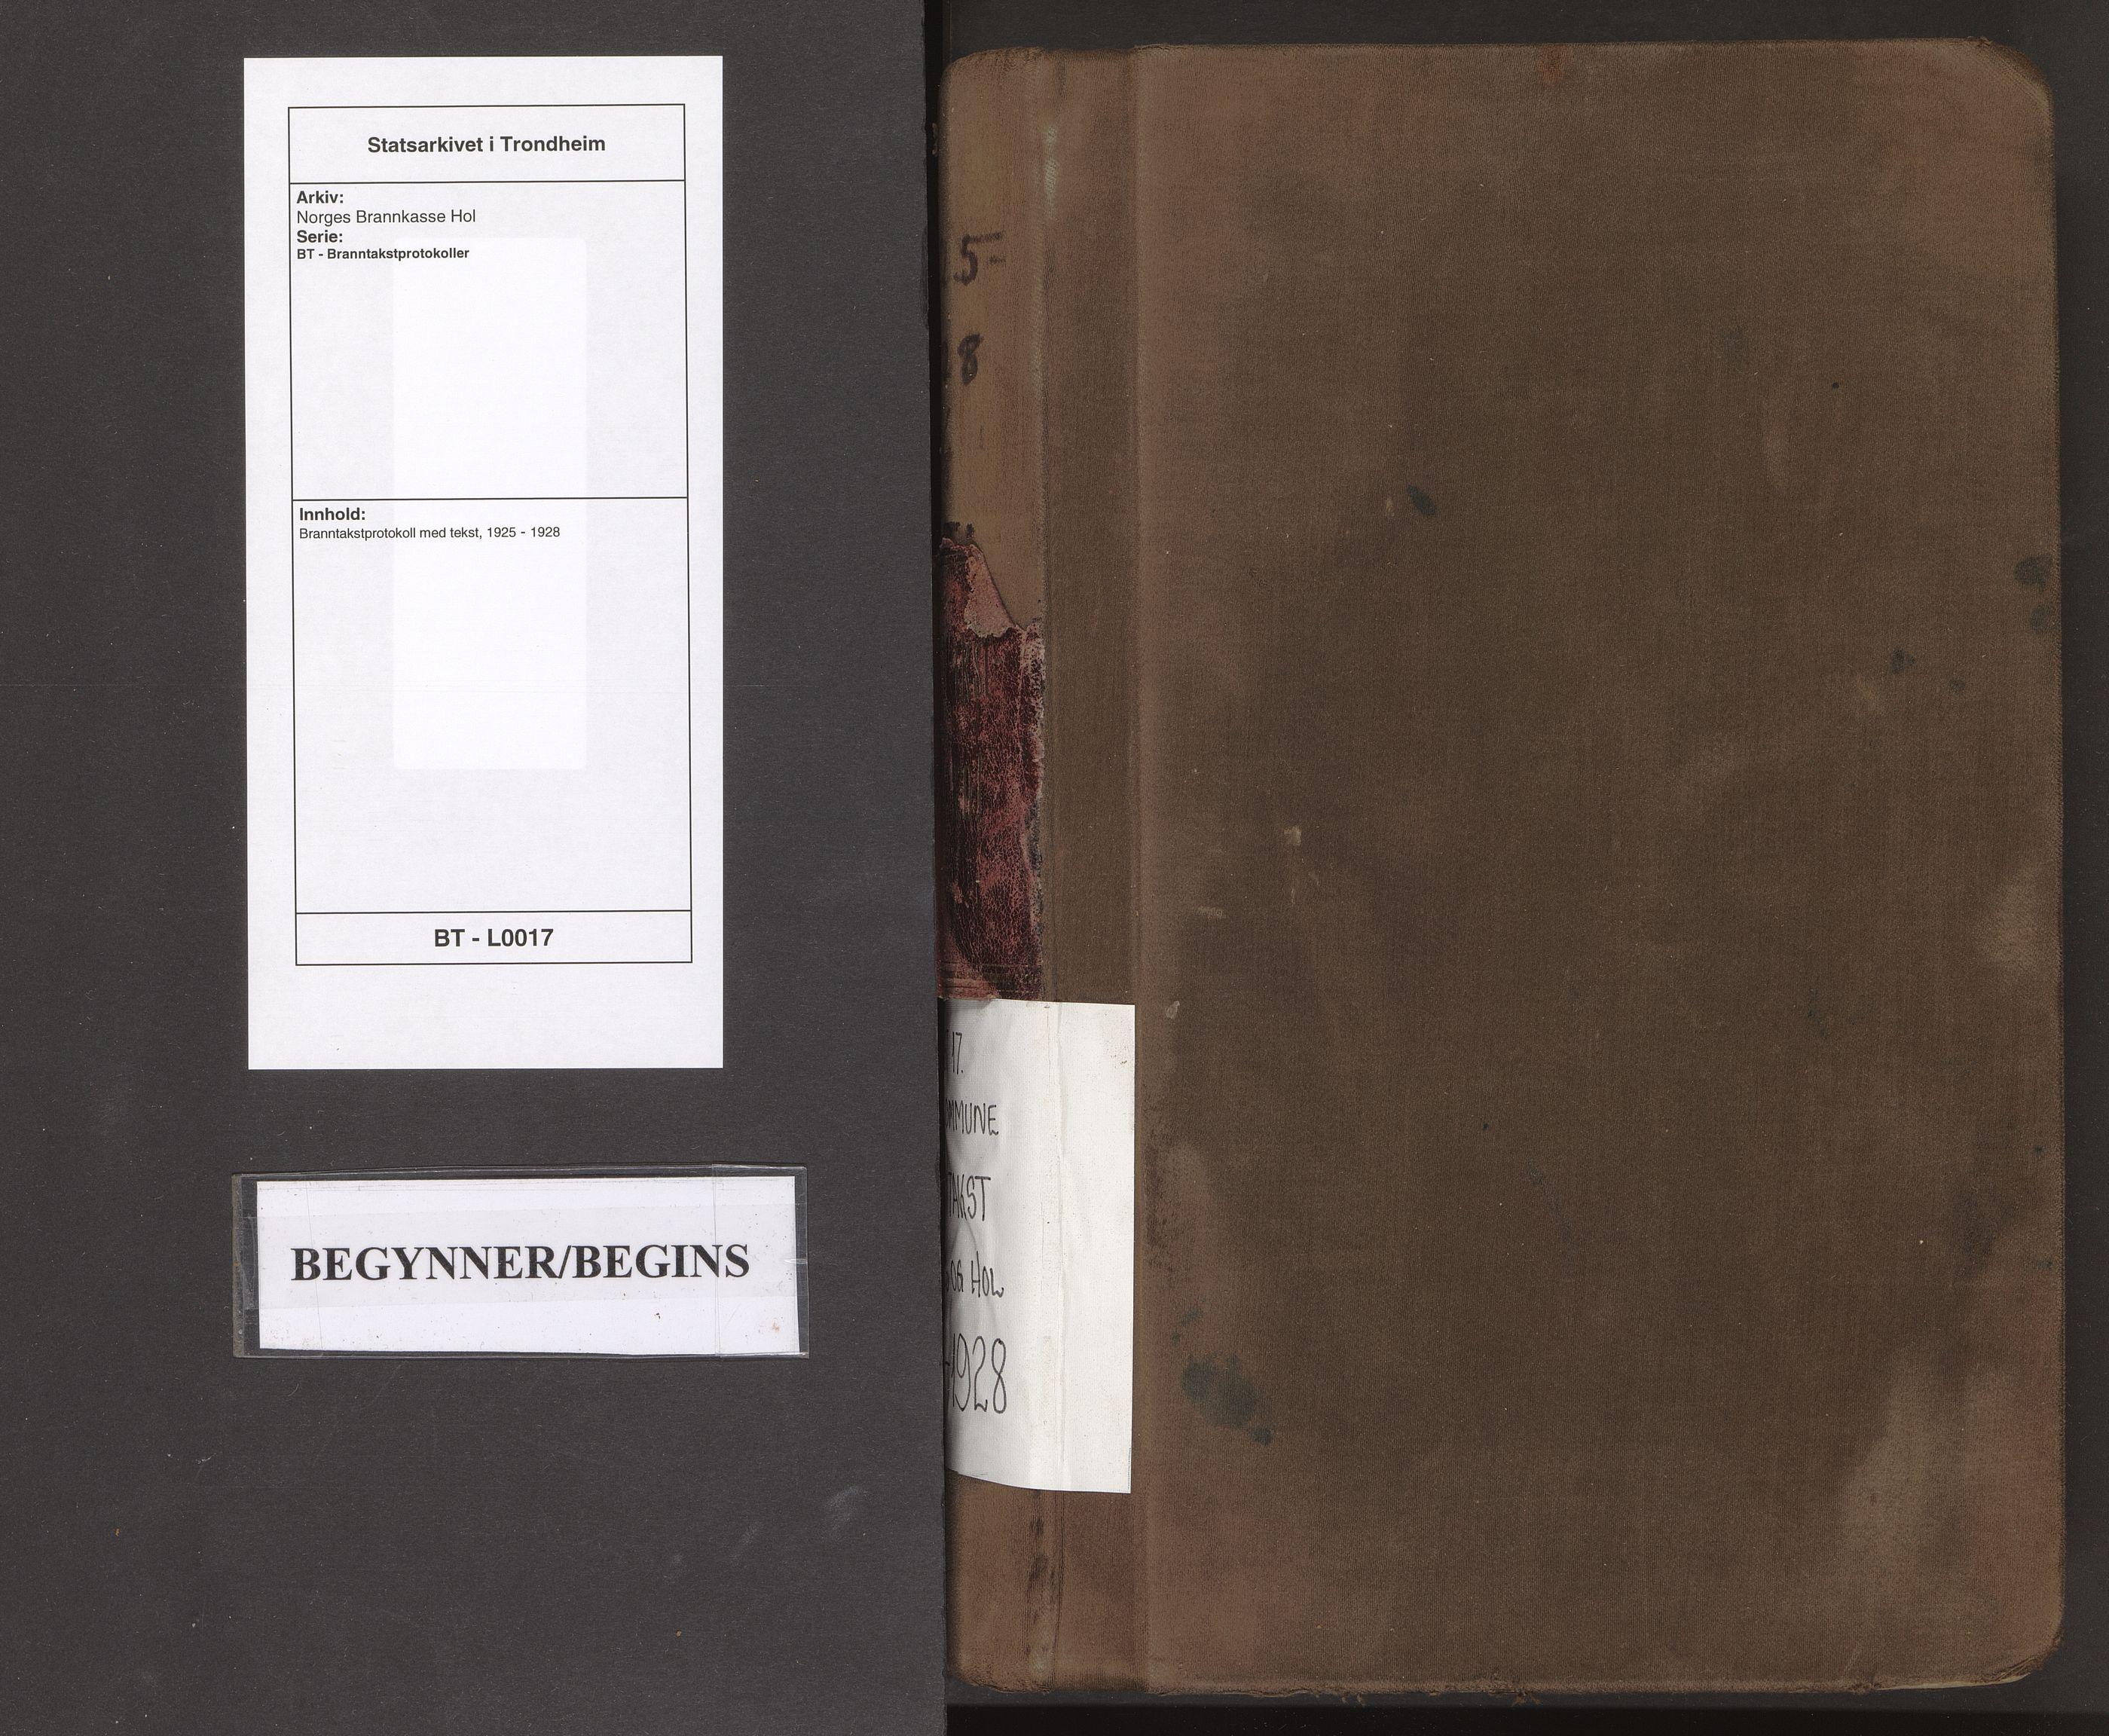 SAT, Norges Brannkasse Hol, BT/L0017: Branntakstprotokoll med tekst, 1925-1928